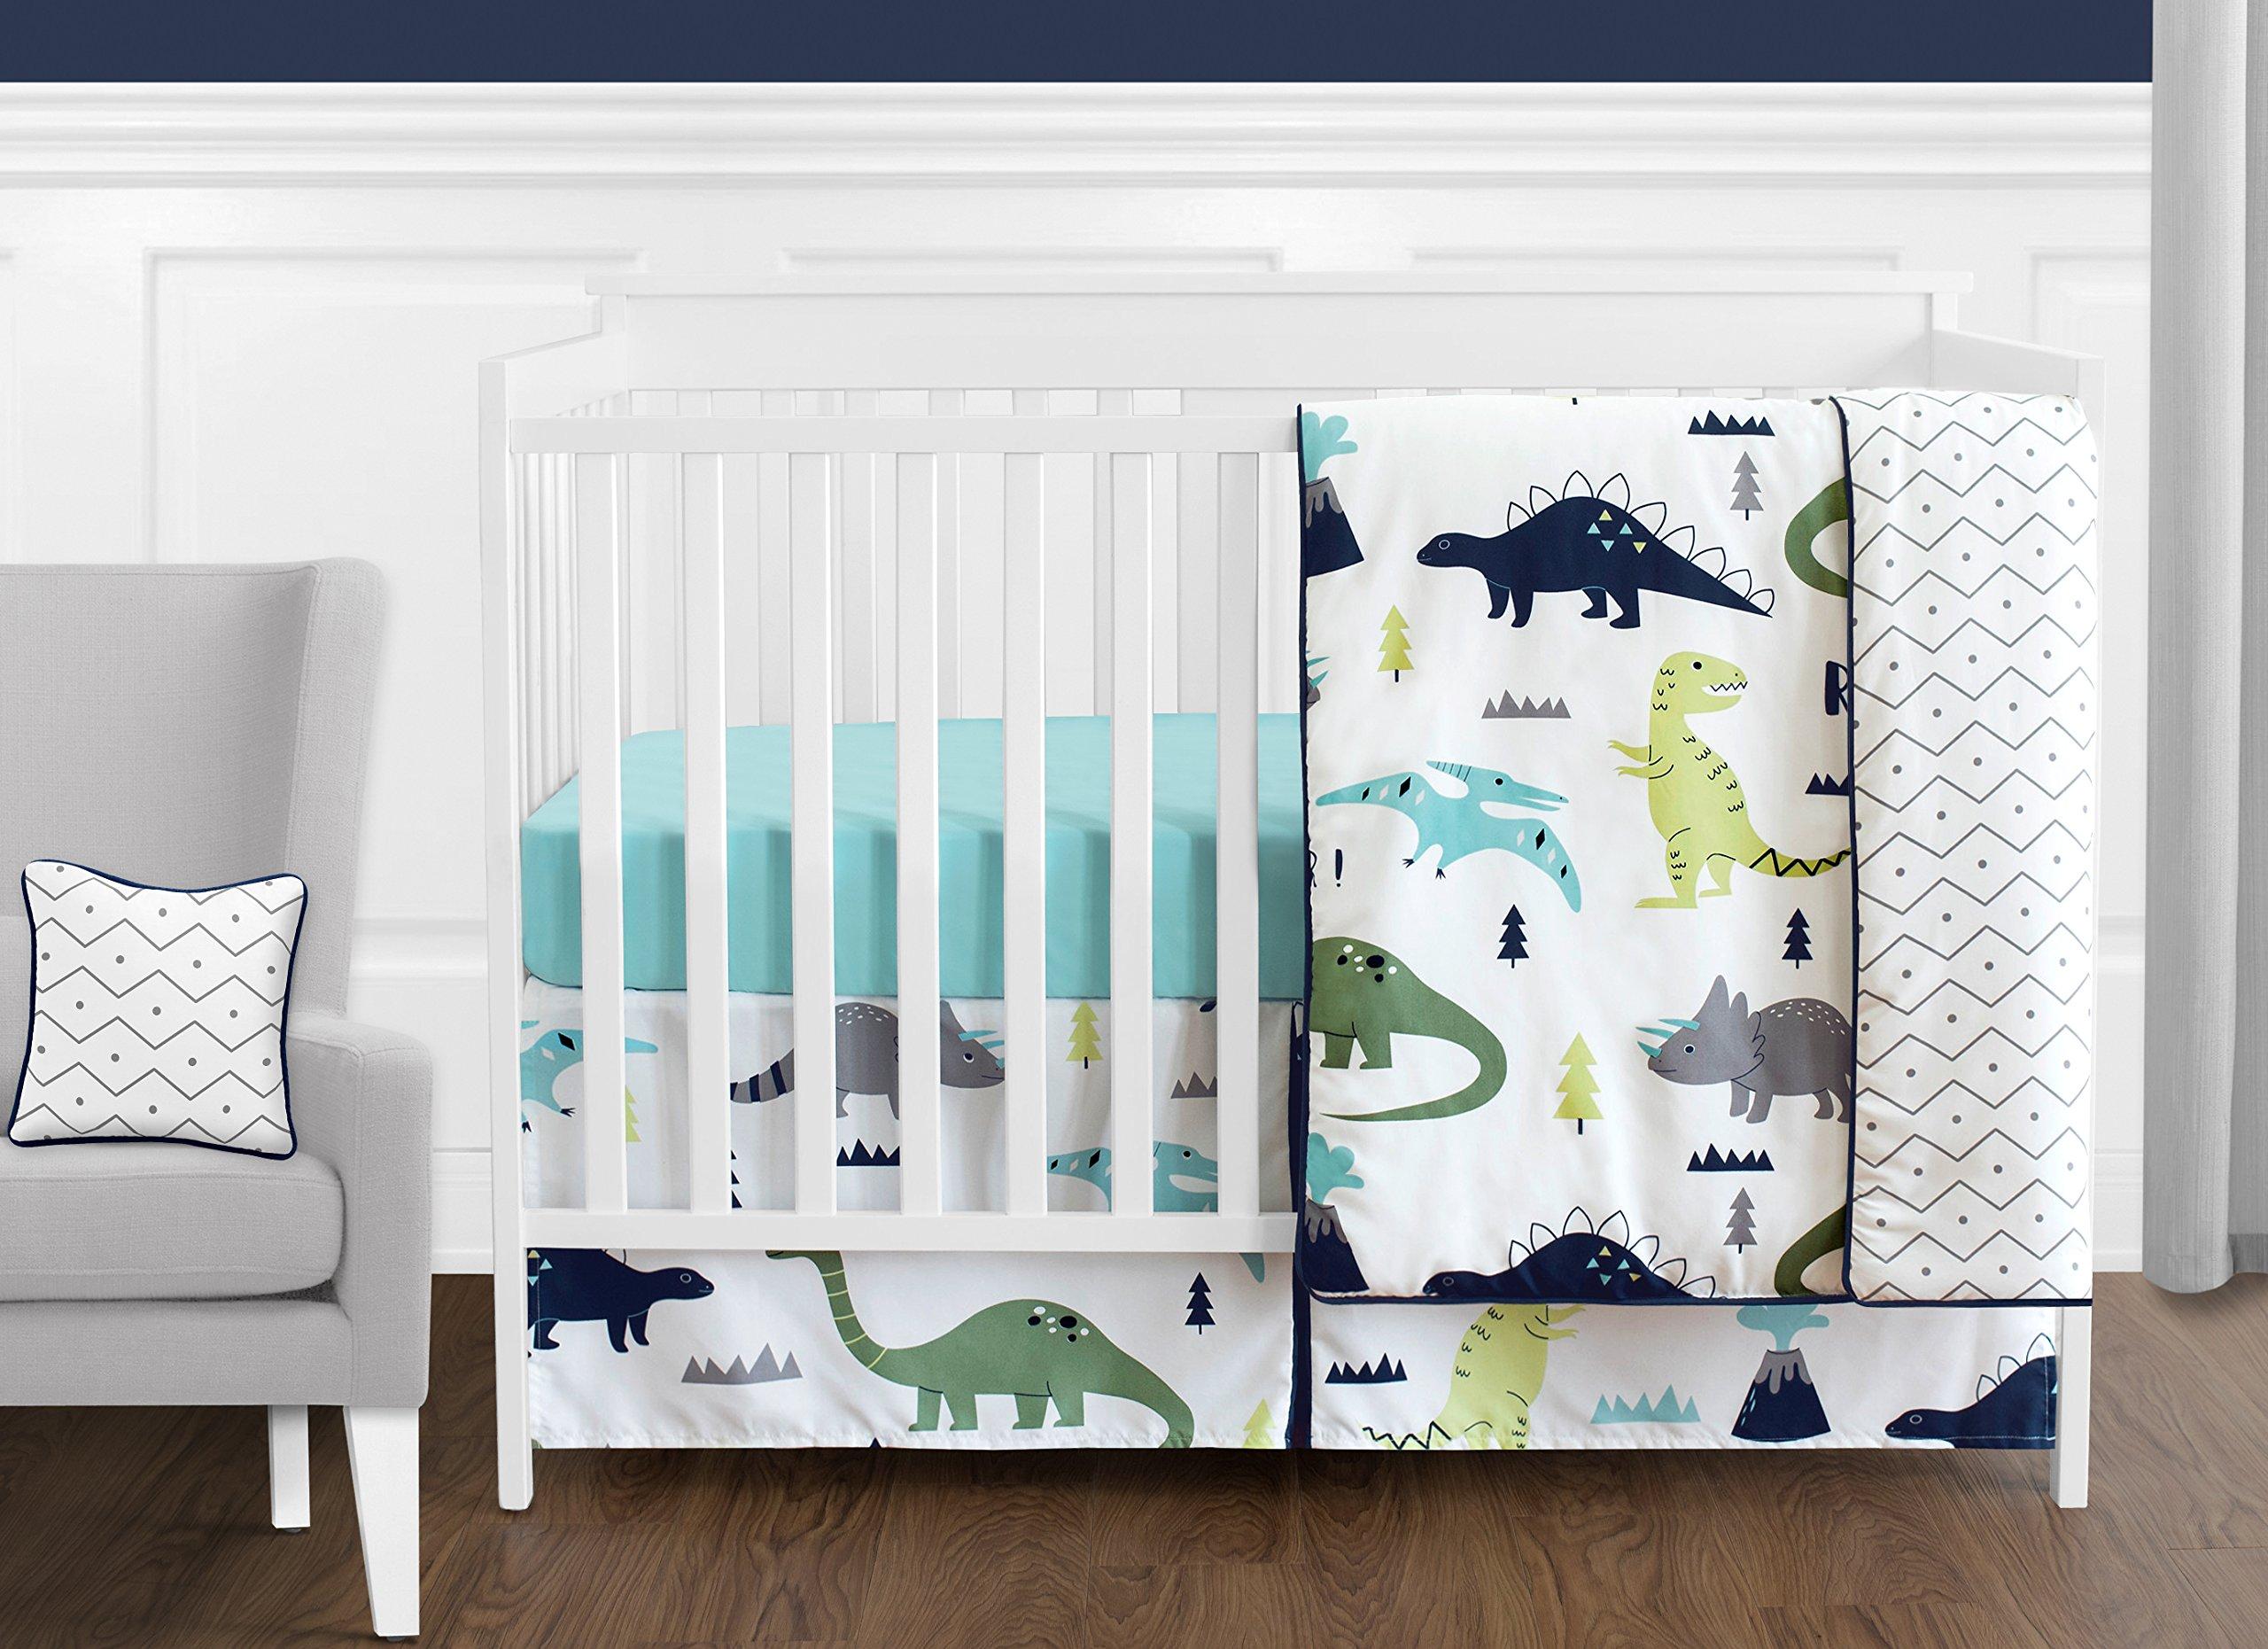 Sweet Jojo Designs 11-Piece Navy Blue and Green Modern Dinosaur Baby Boys or Girls Crib Bedding Set Without Bumper